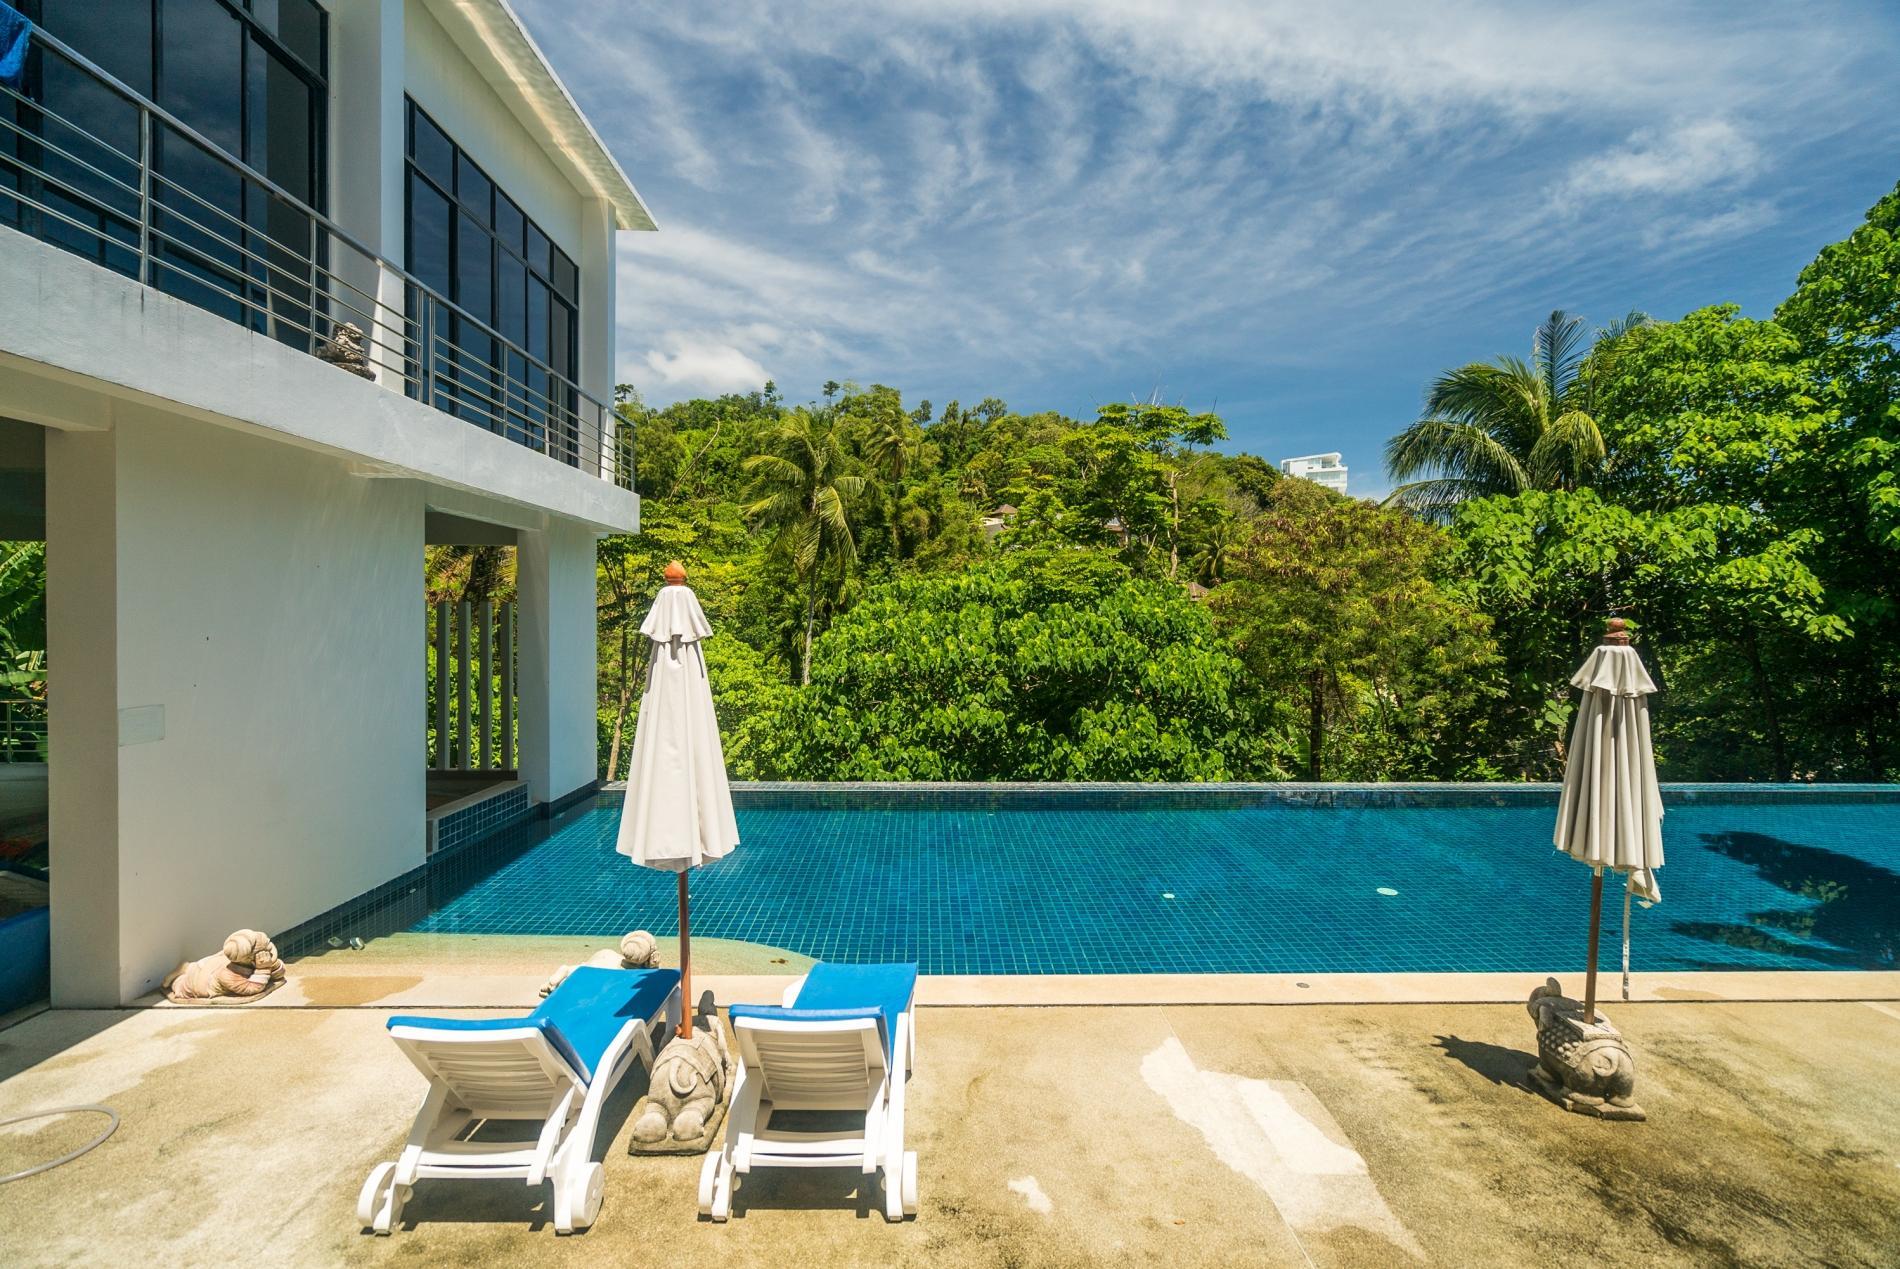 Apartment KH2605 - Sea-view Penthouse in Karon  walk to beach  restaurants  bars  shops photo 20266580